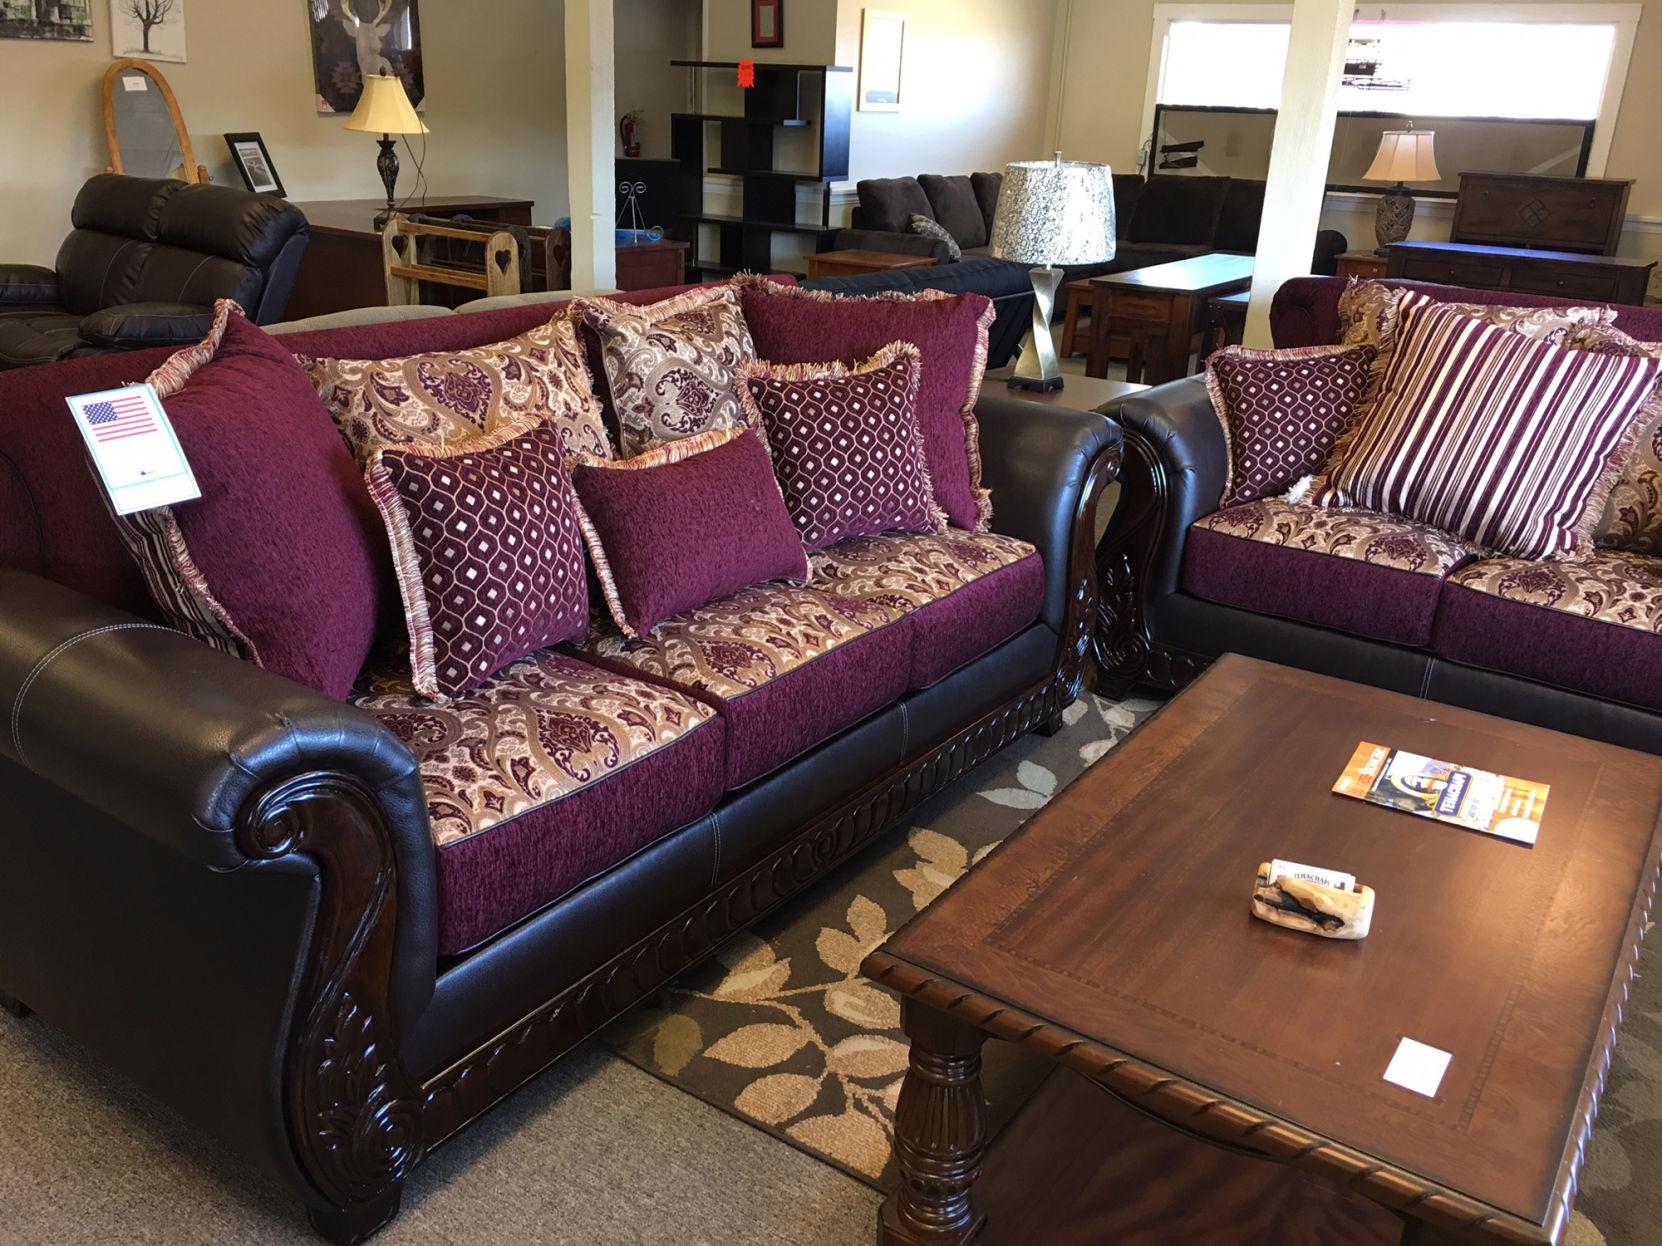 Tehachapi Furniture: Good, Quality Furniture At Reasonable Prices